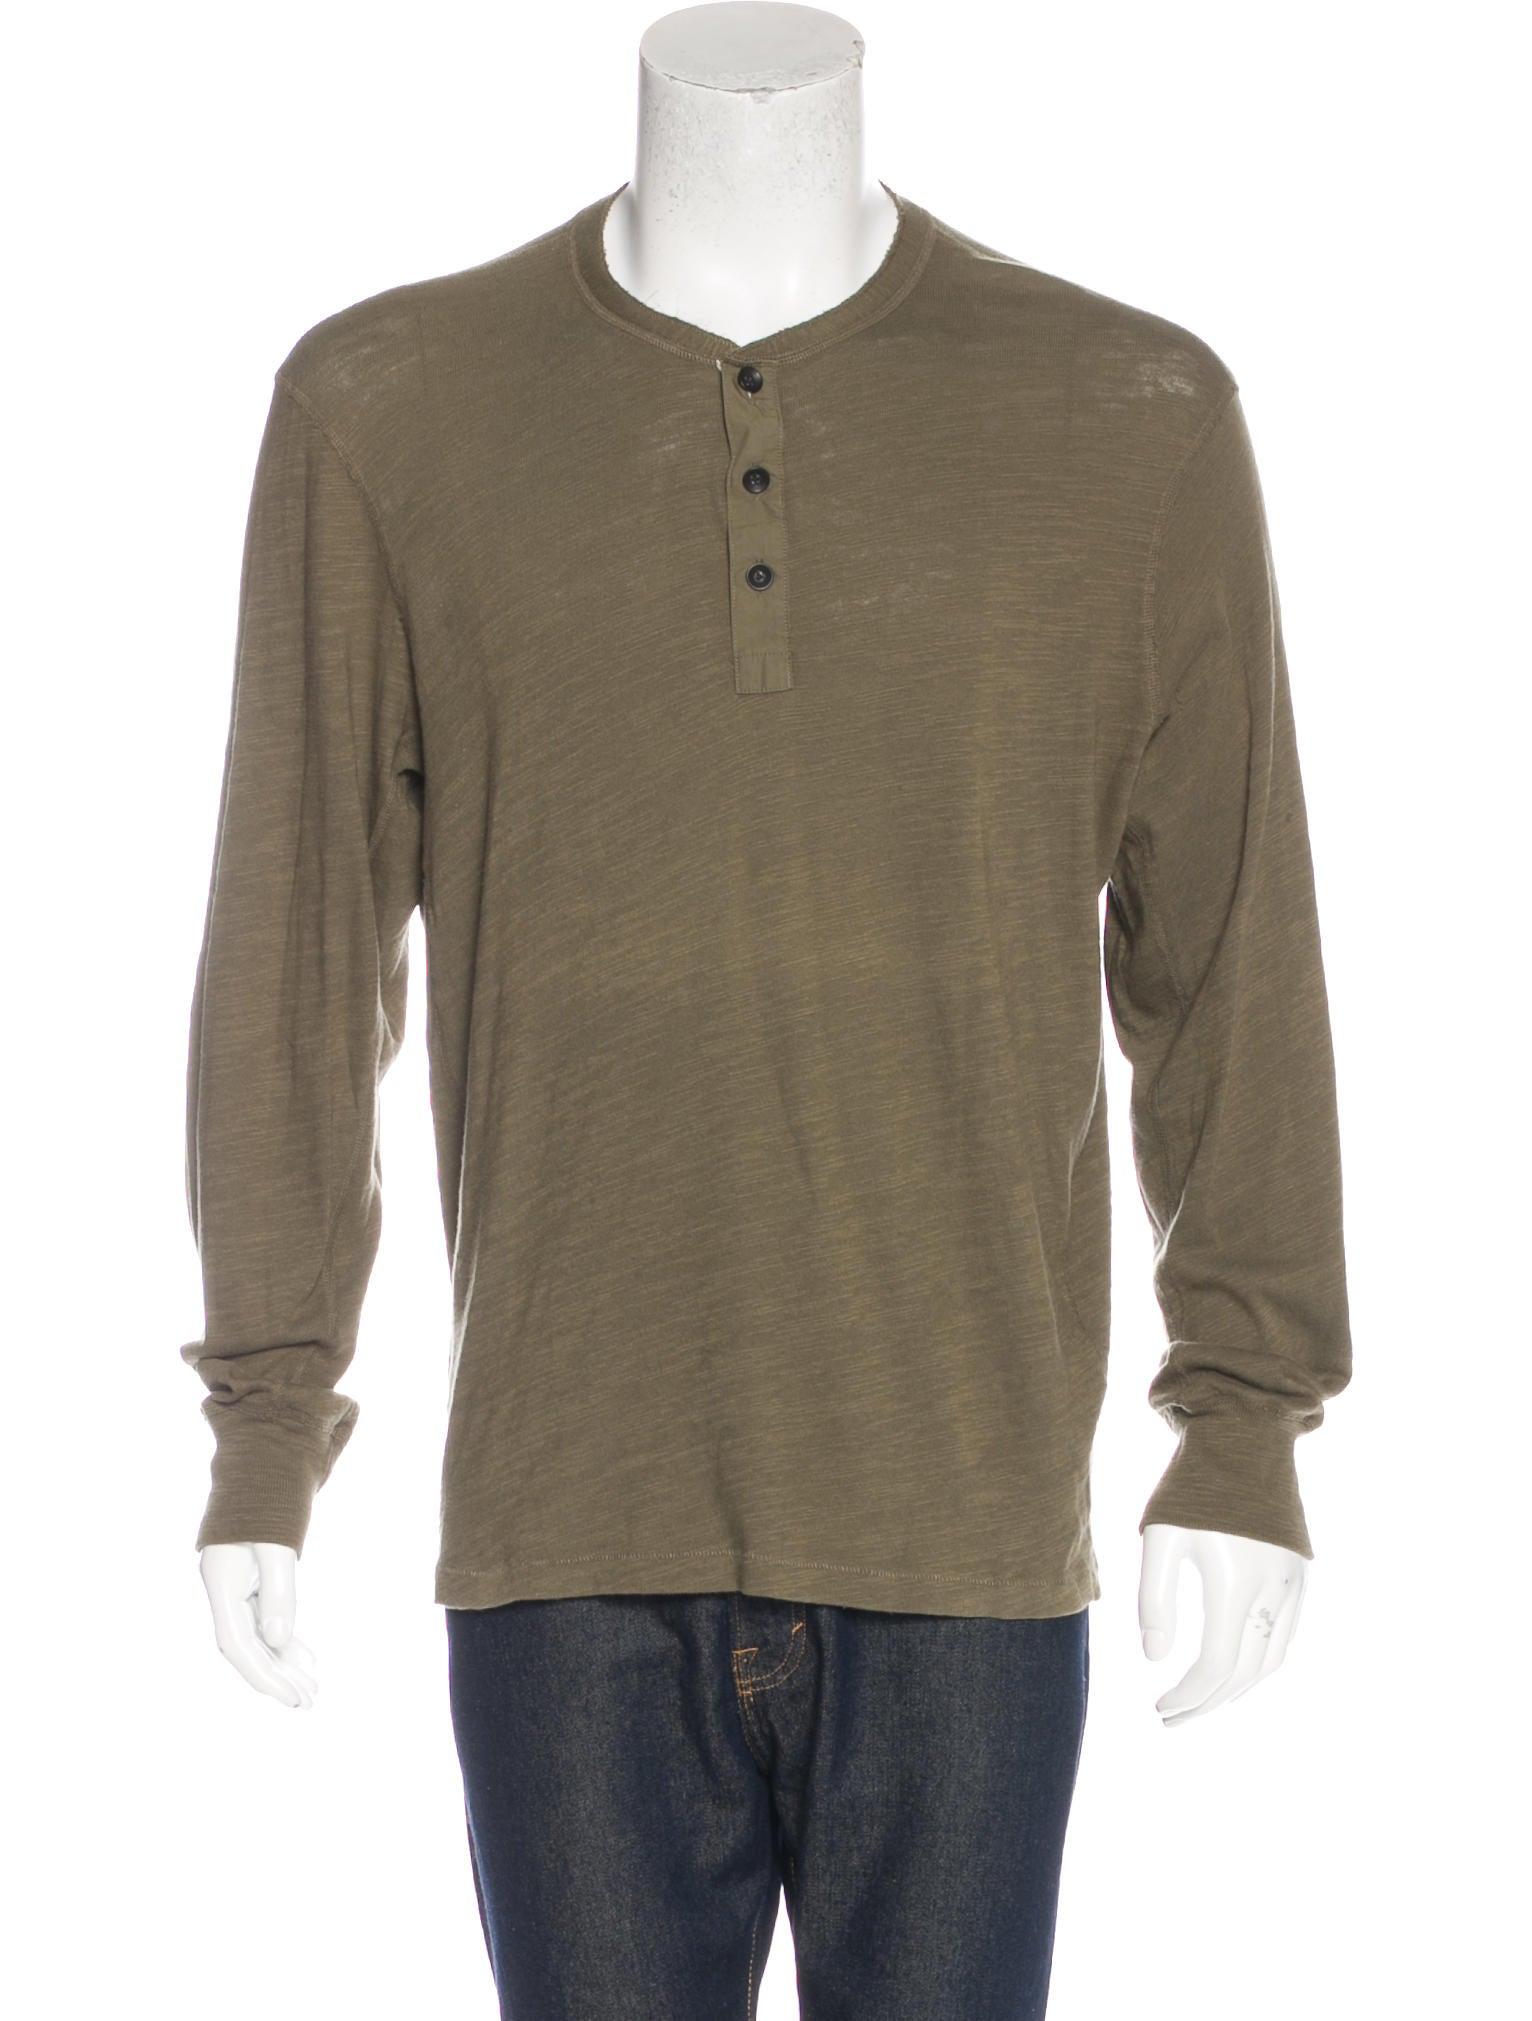 Rag bone long sleeve henley t shirt clothing for Henley t shirt long sleeve